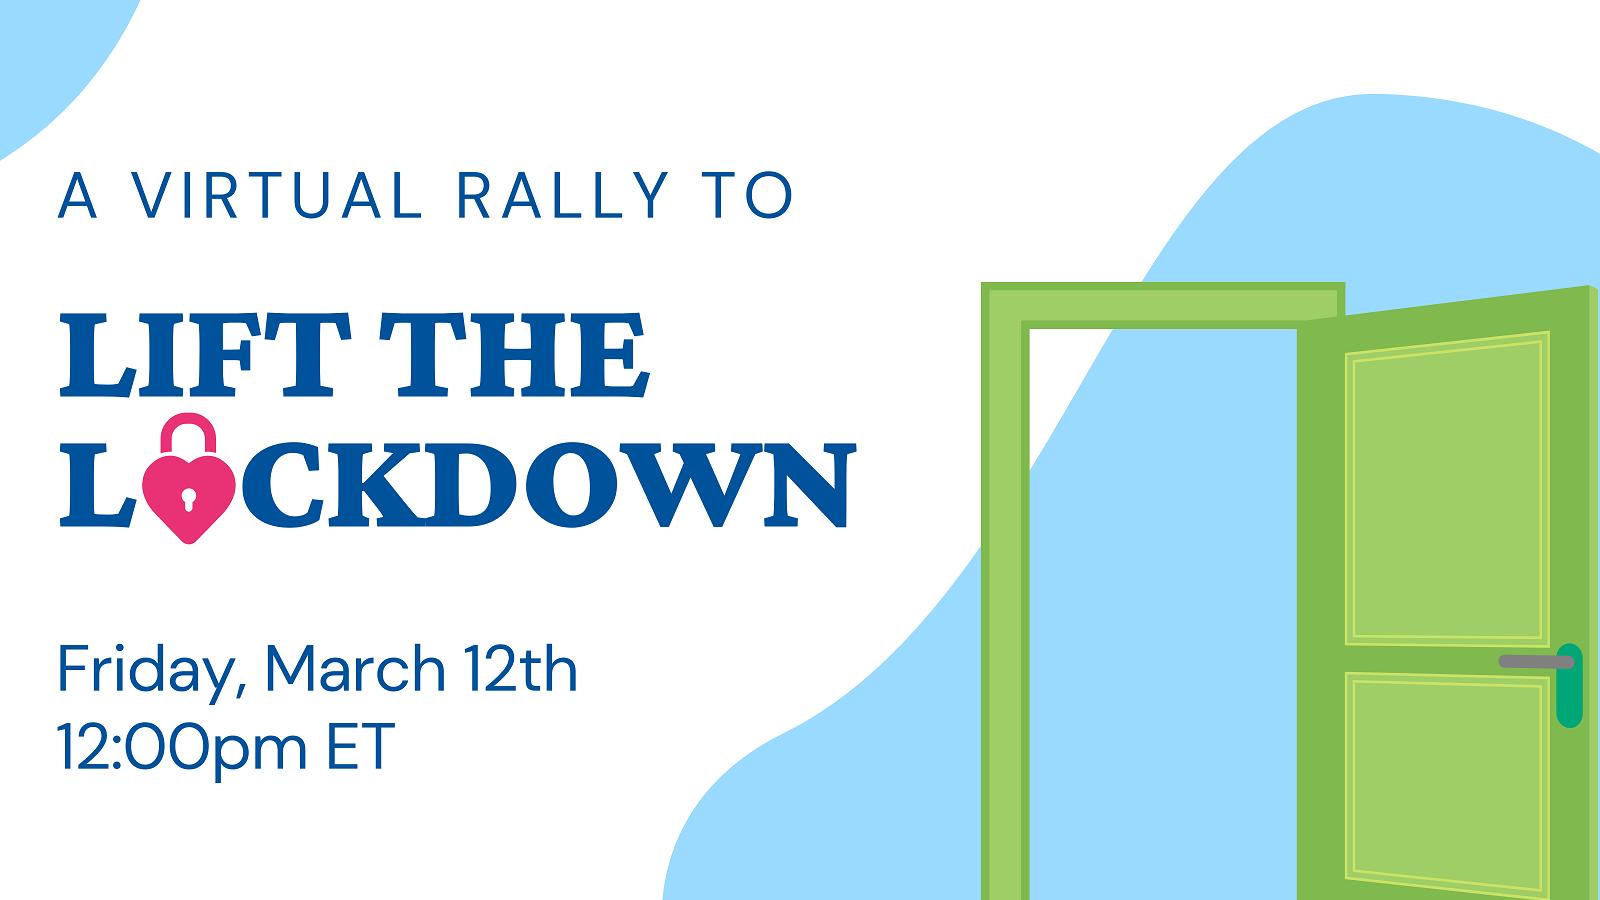 Lift the Lockdown Rally